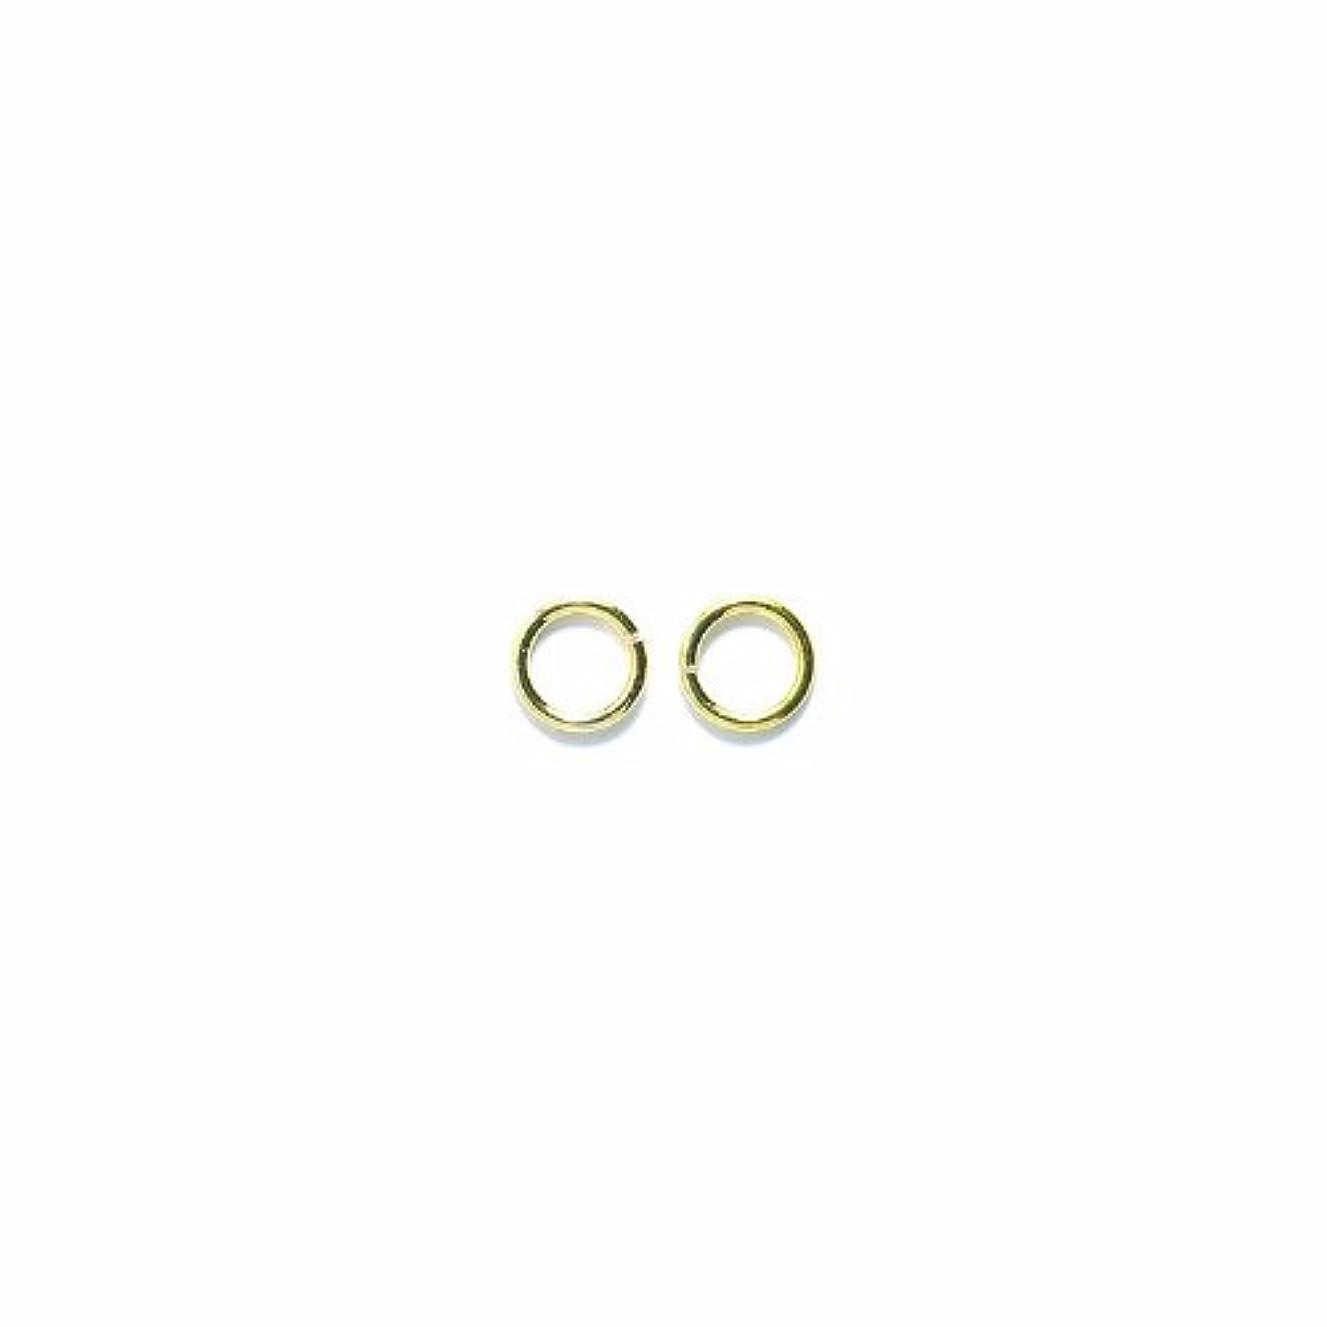 Shipwreck Beads Plated Brass Jump Ring, 7 mm, 18-Gauge, Metallic, Gold, 50 gm Pack